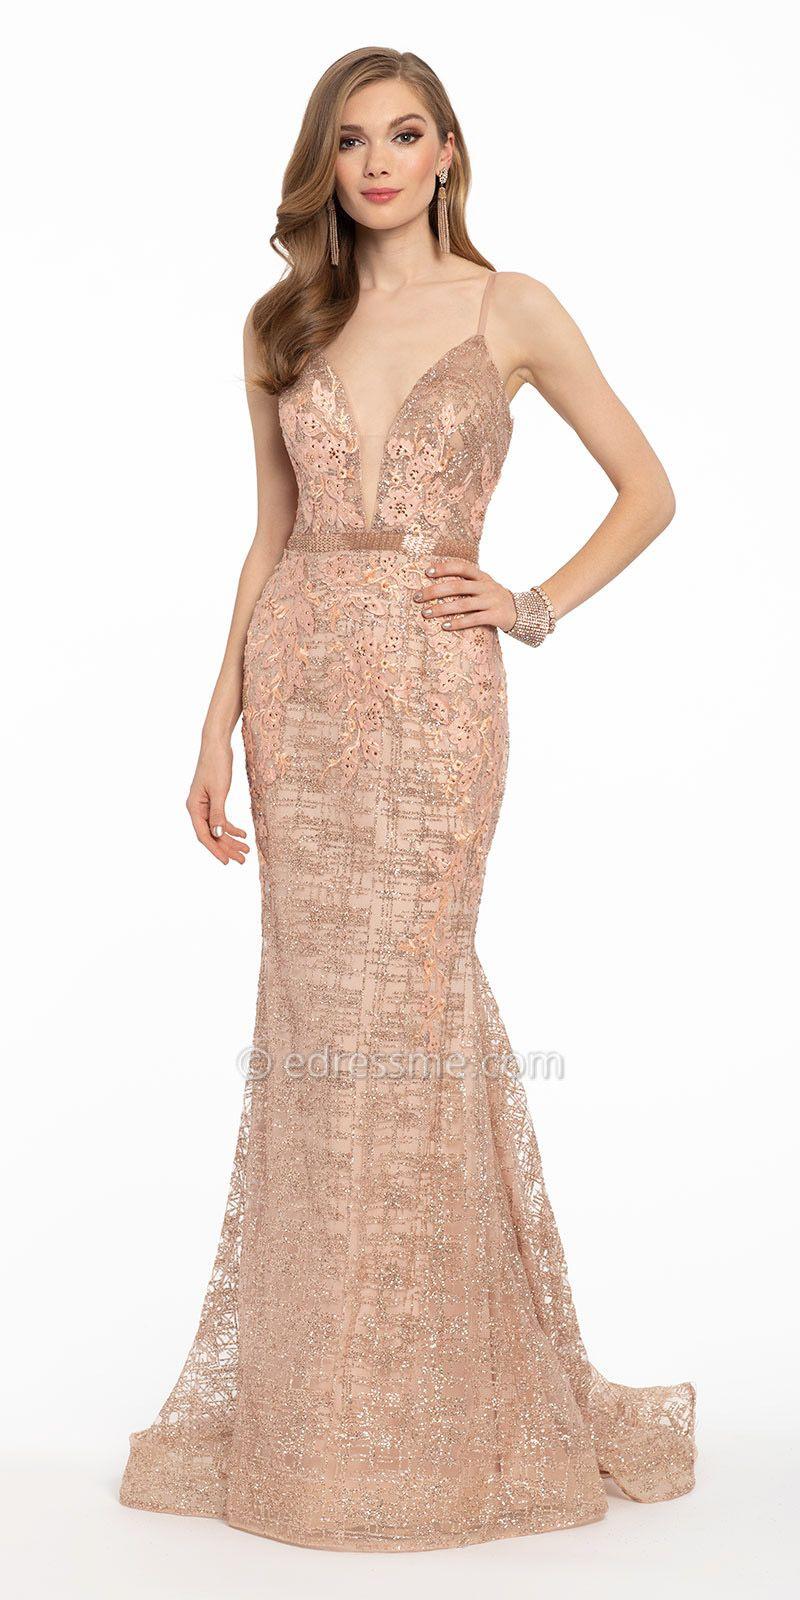 Plunging Glitter Mermaid Dress Homecoming Dresses Long Dresses Mermaid Dress [ 1600 x 800 Pixel ]